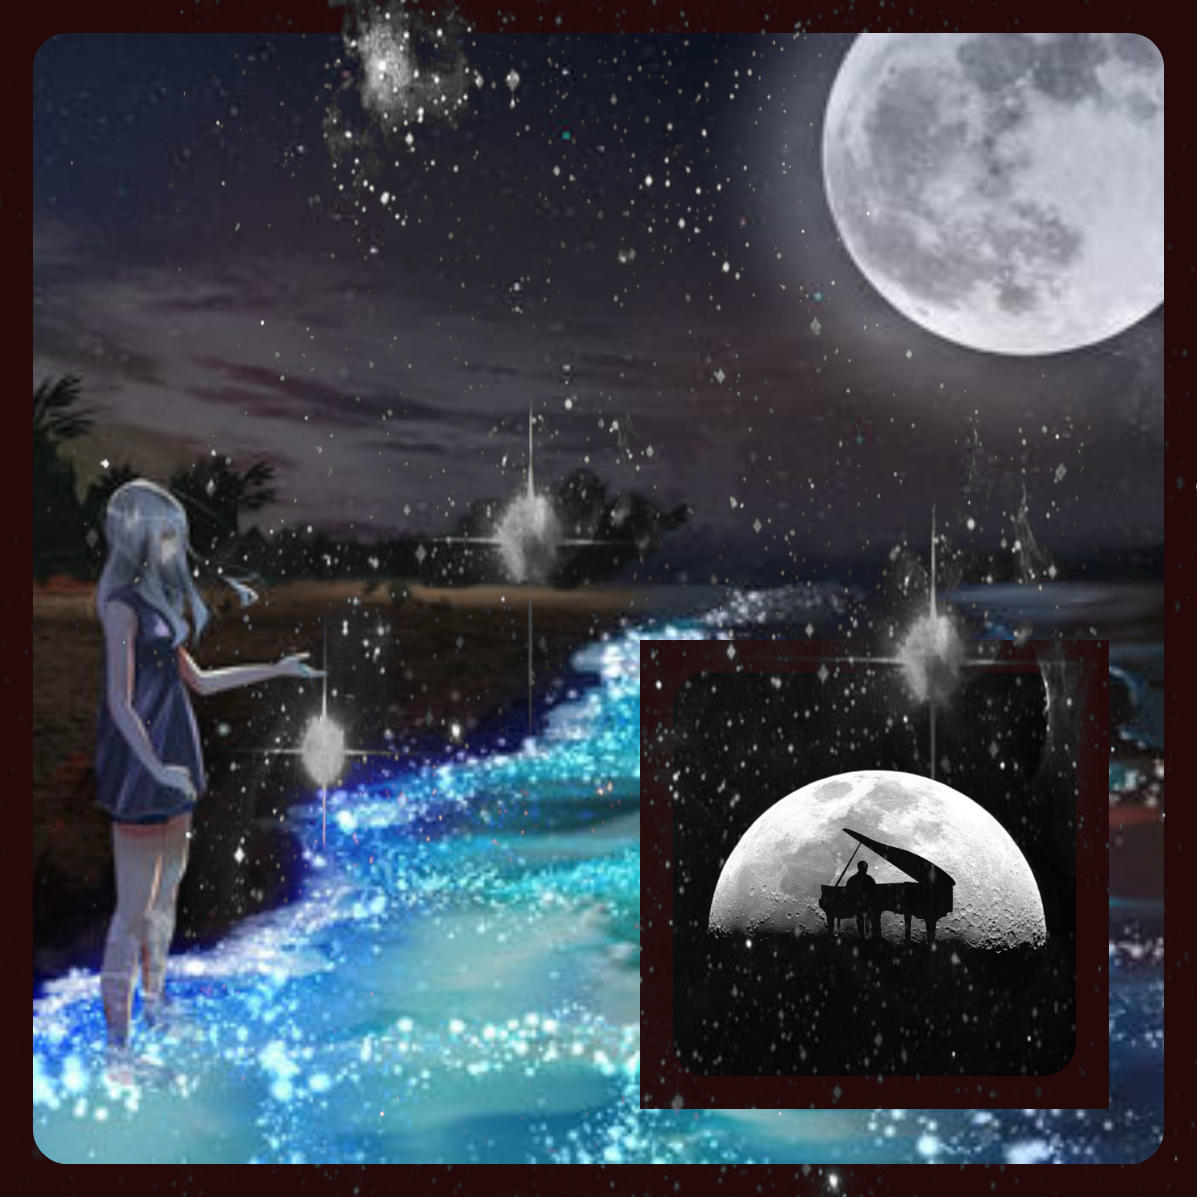 картинки звездопада или луны меню шато